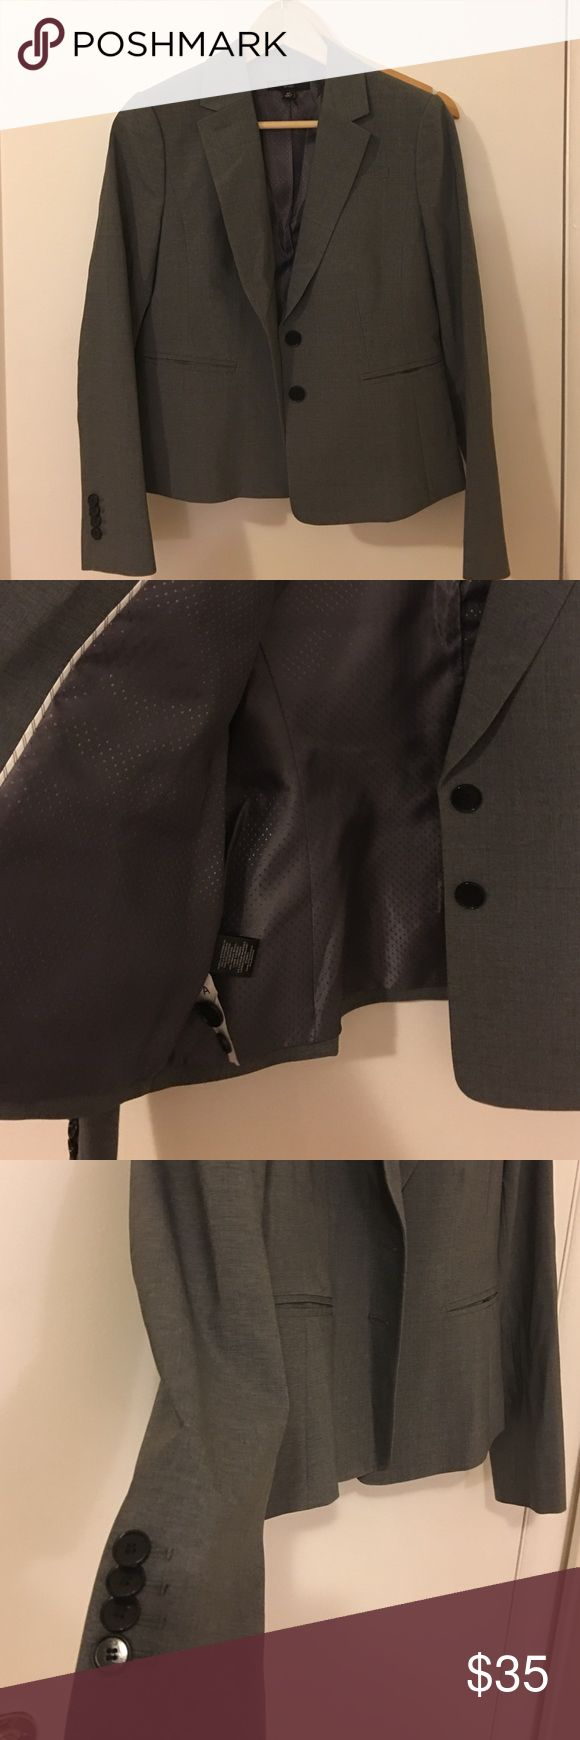 Selling this Ann Taylor gray blazer in size 8Petite on Poshmark! My username is: vanessita_jd. #shopmycloset #poshmark #fashion #shopping #style #forsale #Ann Taylor #Jackets & Blazers